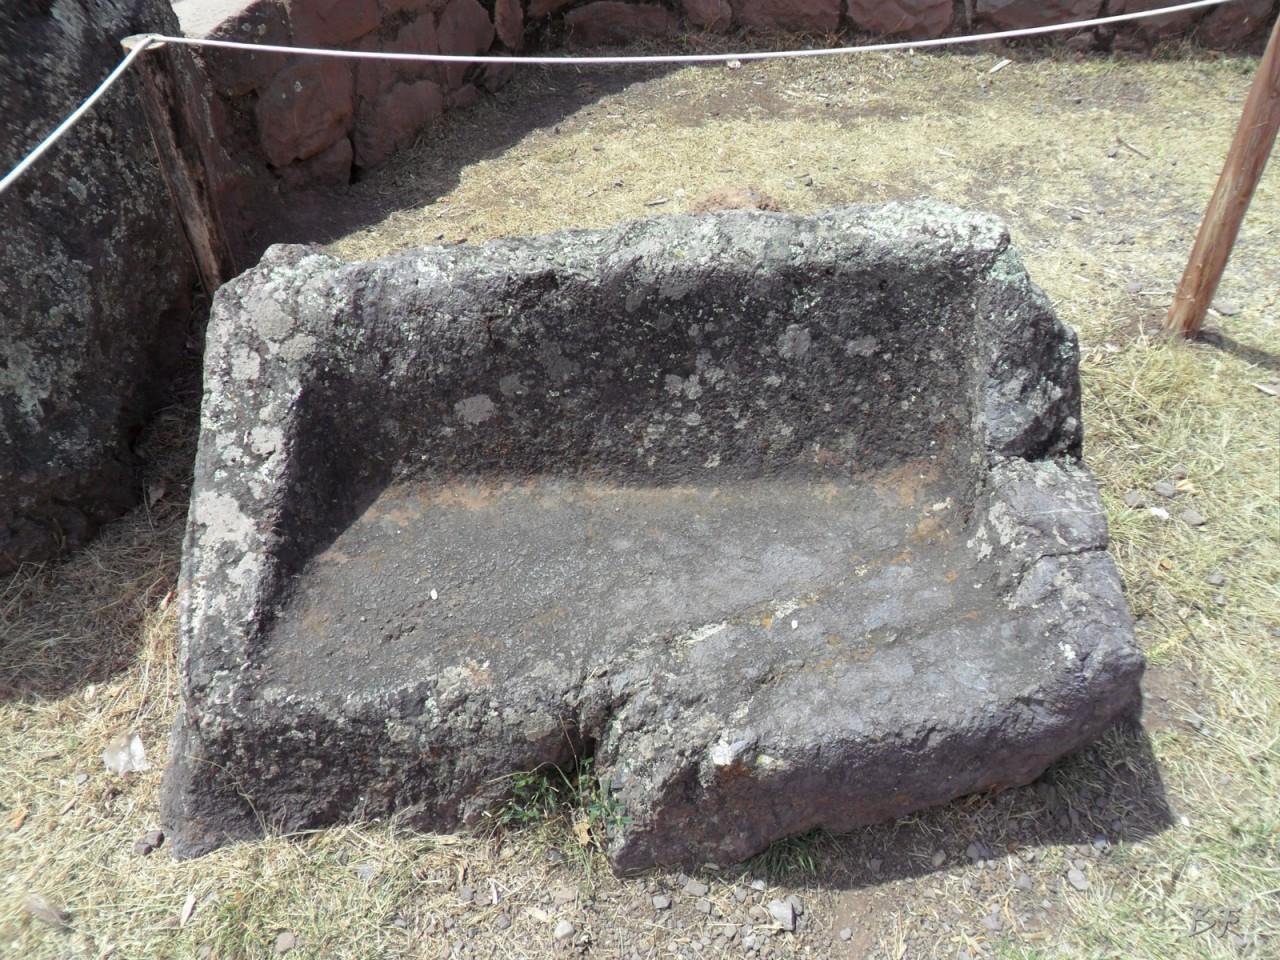 Mura-Poligonali-Megaliti-Altari-Rupestri-Pisac-Cusco-Perù-39